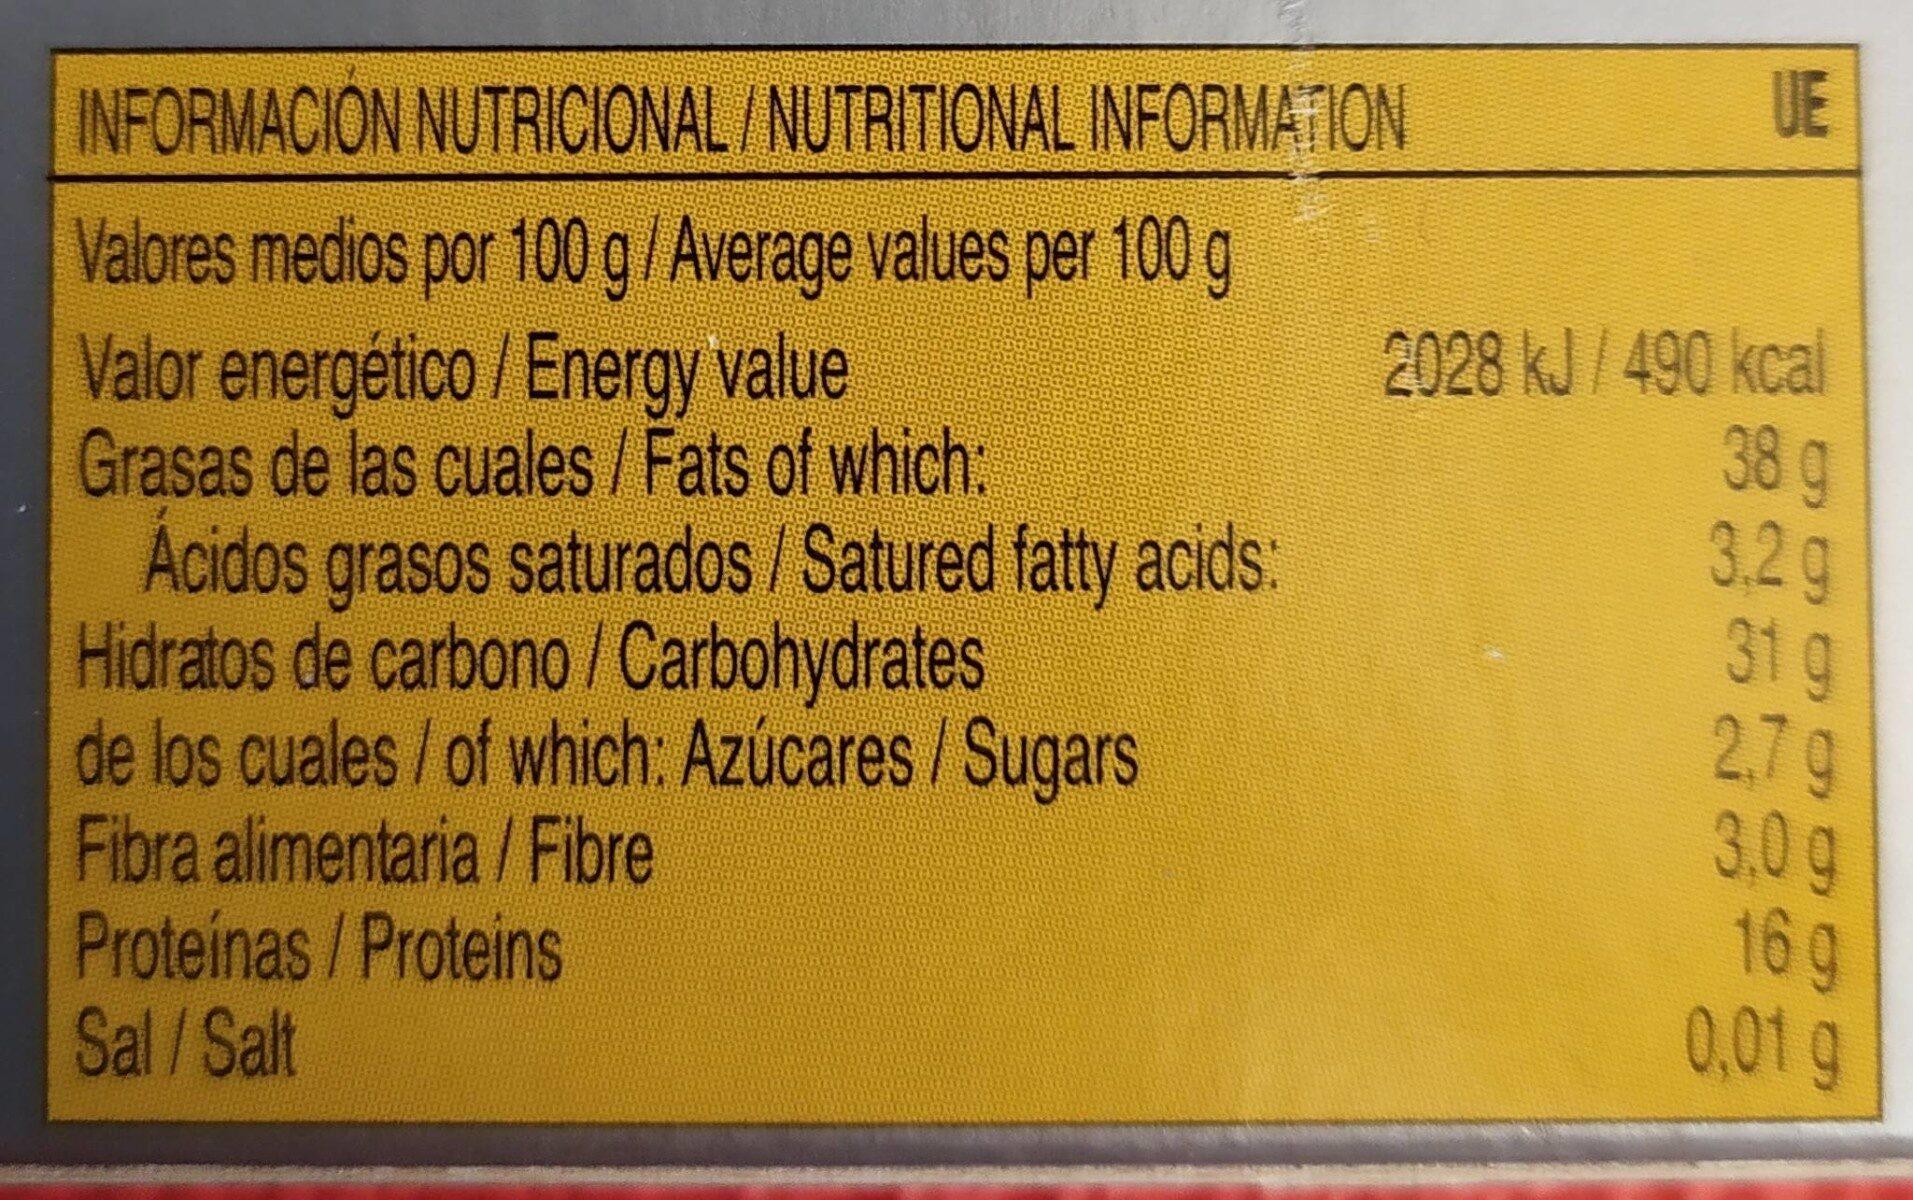 Sugar Free Crunchy Alicante Turron Candy (7 Oz / 200 G) - Informations nutritionnelles - fr